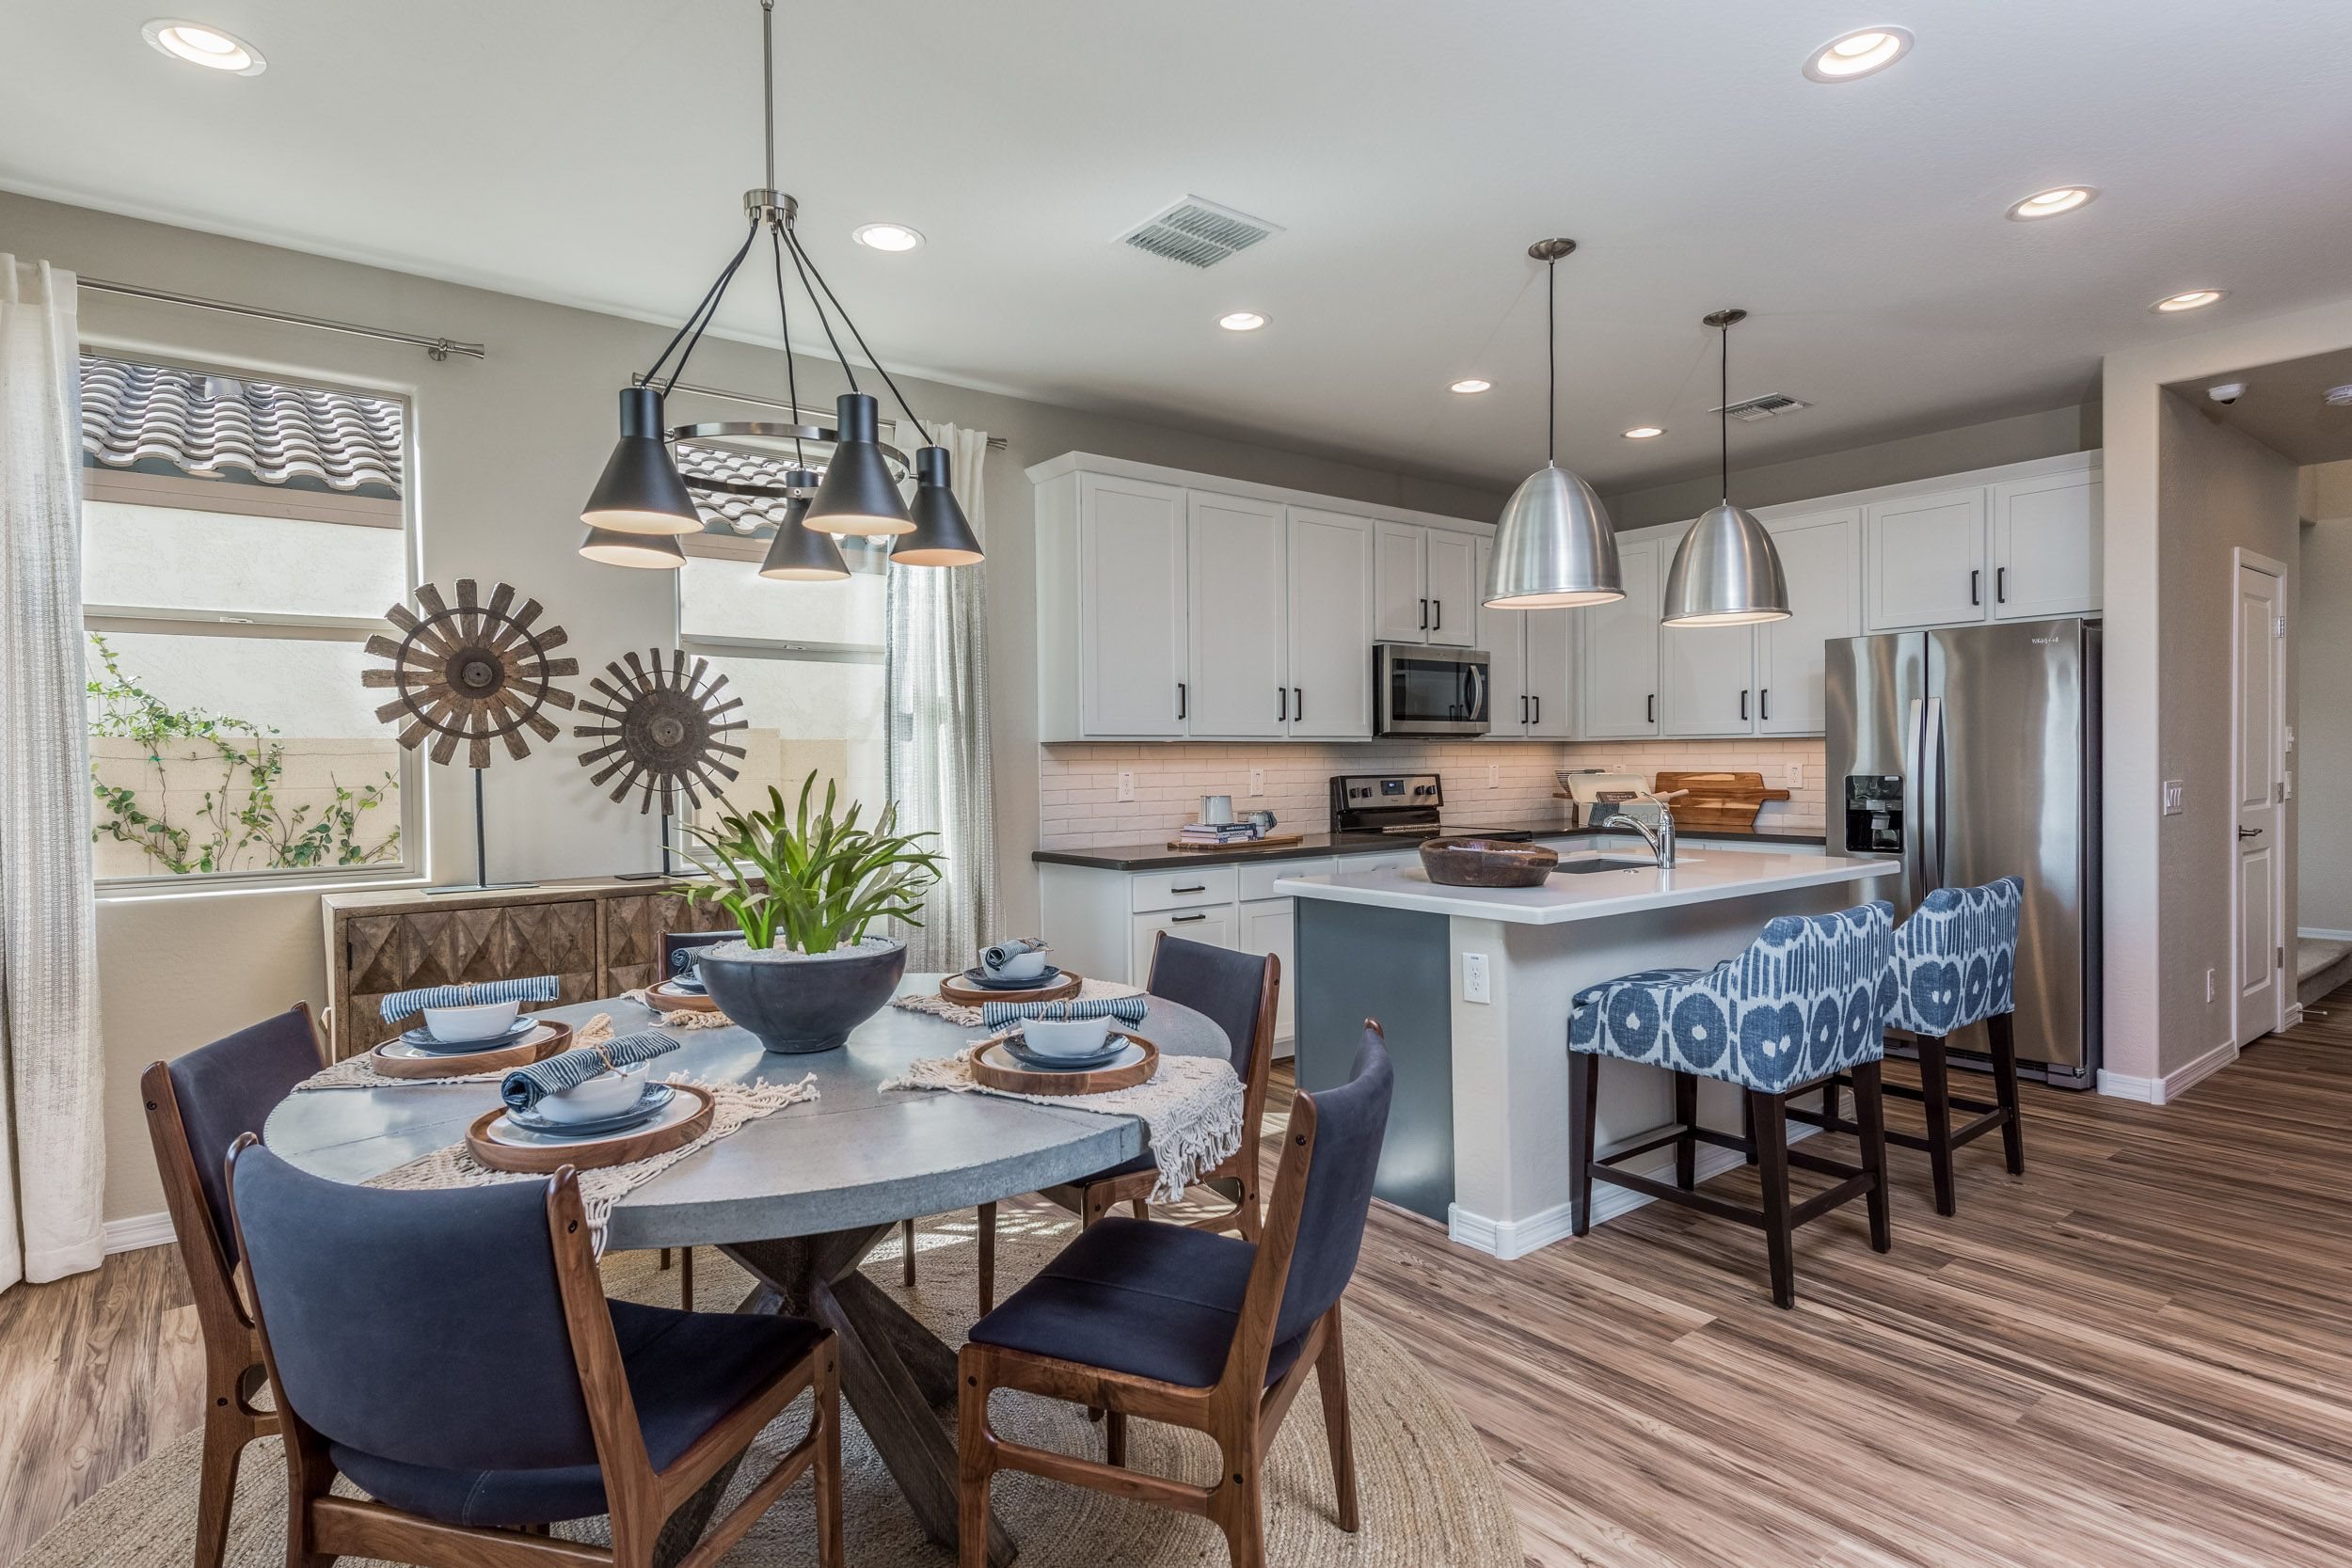 Sunleya Taylor Morrison Homes Arizonahomes Homesforsale